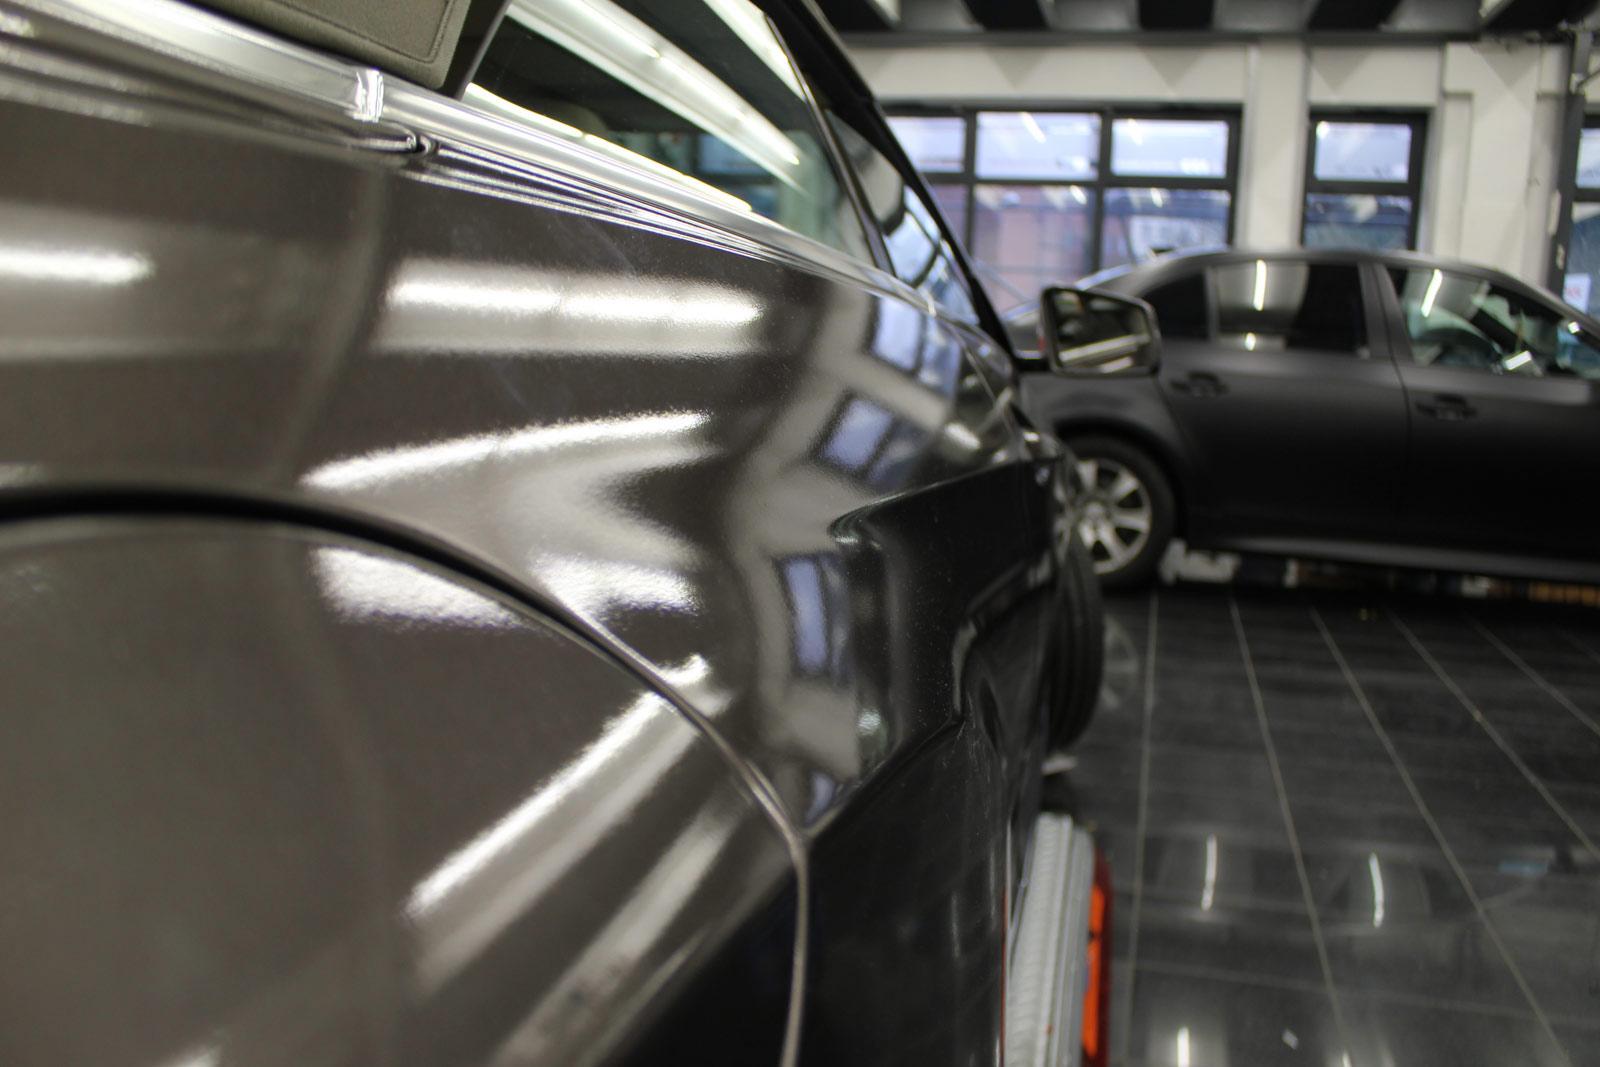 Mercedes_E-Klasse_Cabrio_Folierung_Stannitgrau_Metallic_Glanz_21